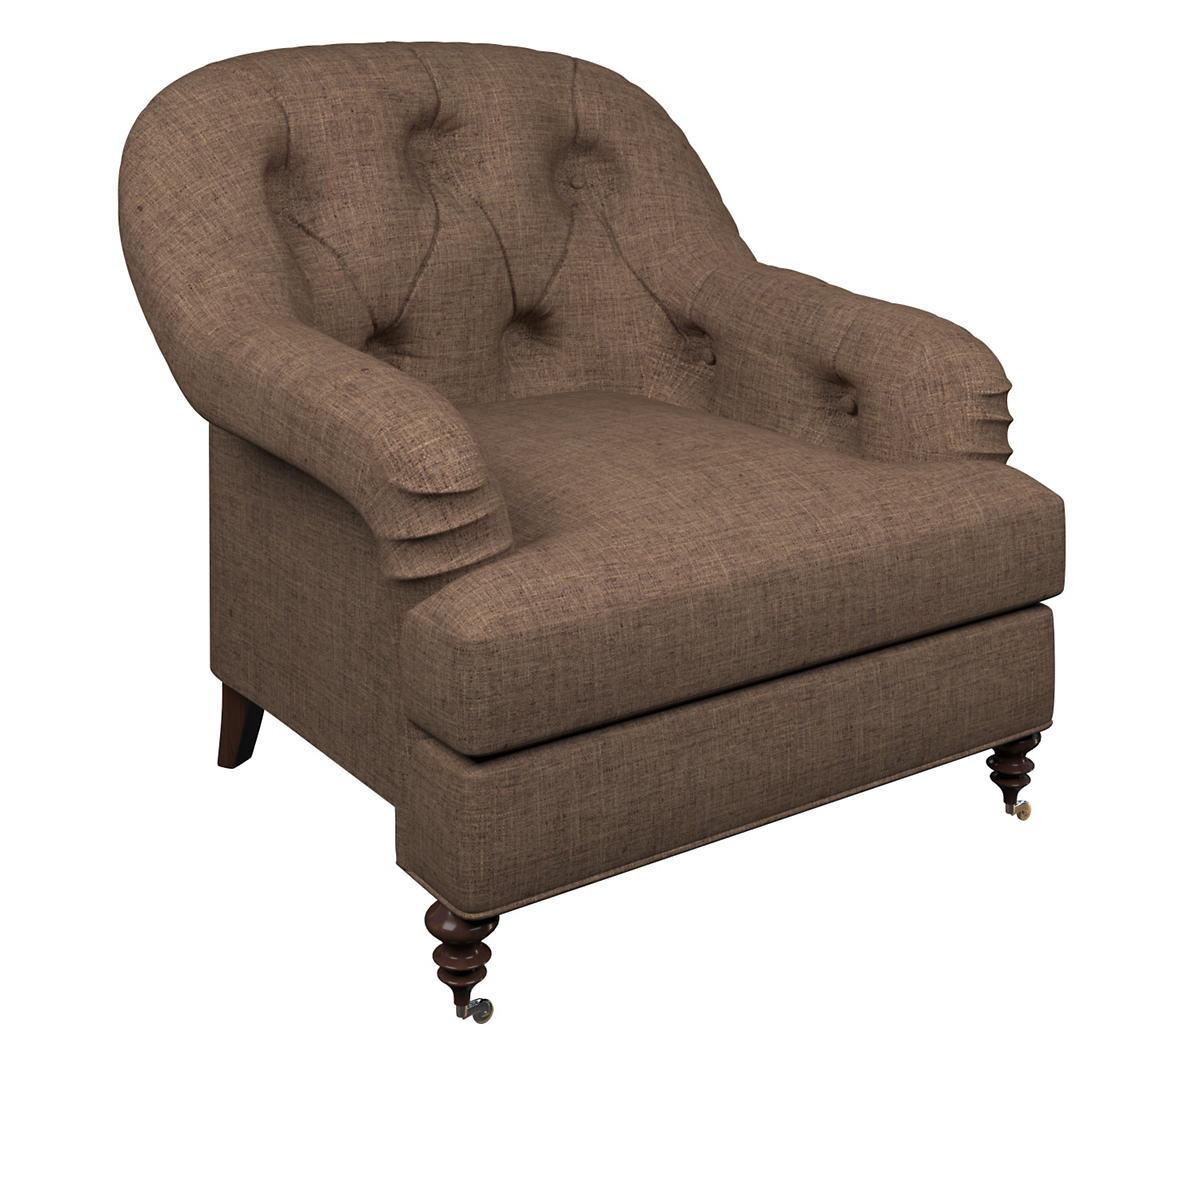 Greylock Brown Norfolk Chair